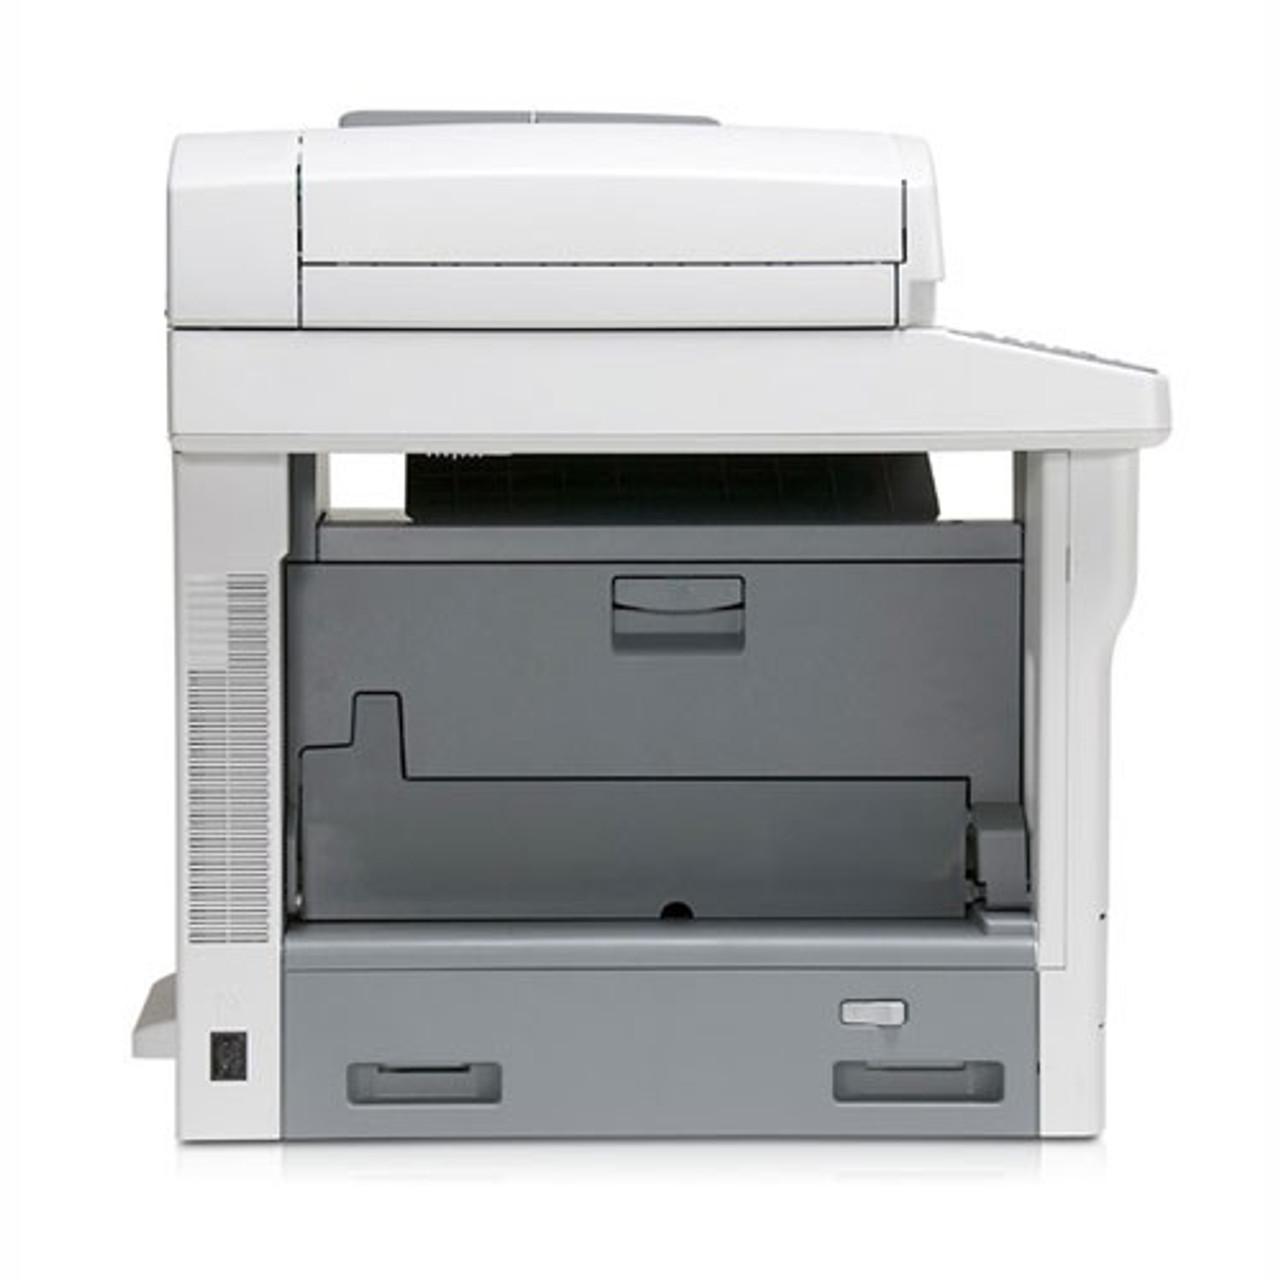 HP LaserJet M5035 MFP Laser Printer